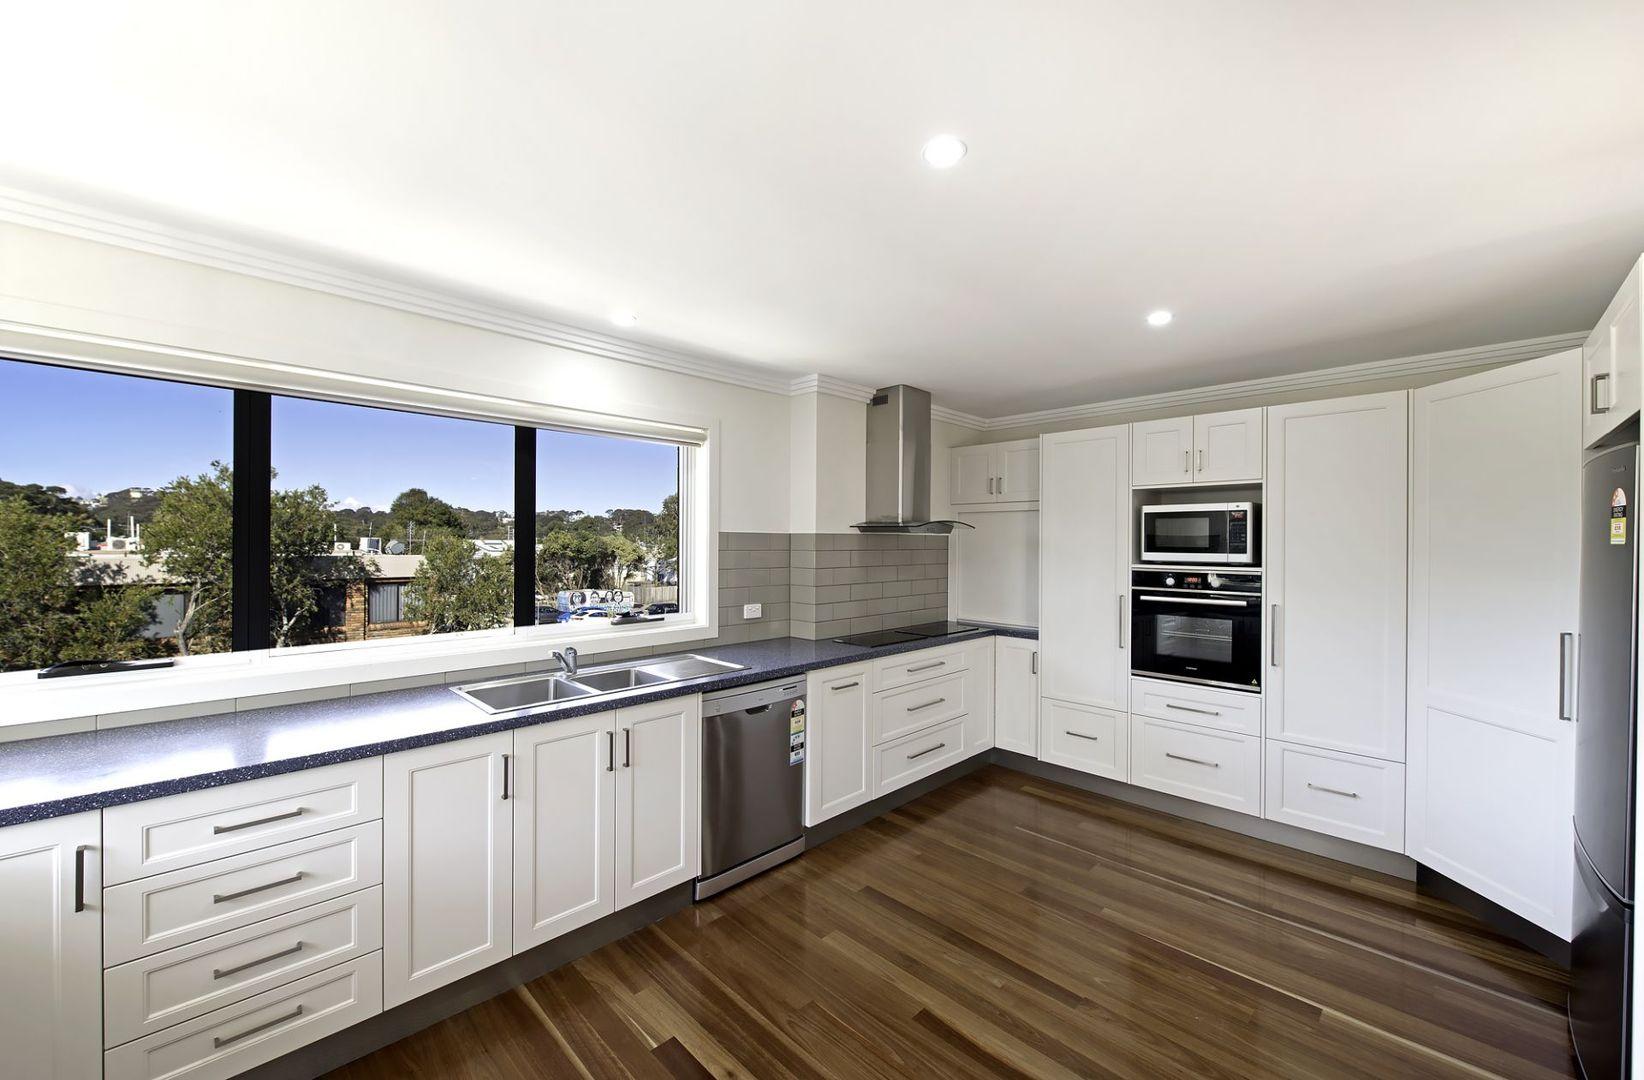 9/2 Burrawang Street, Narooma NSW 2546, Image 1